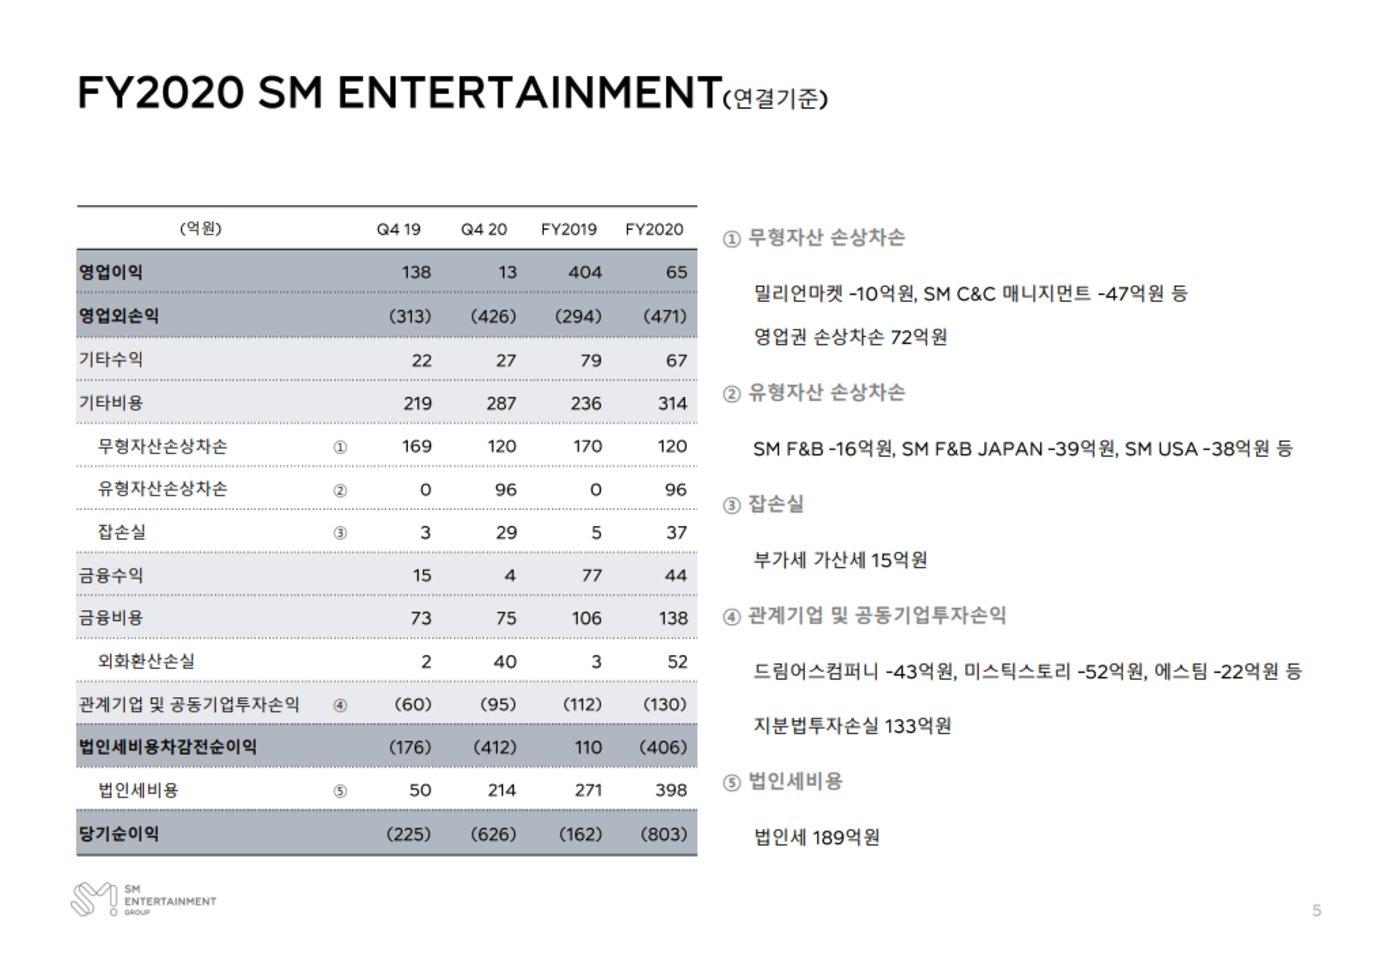 SM官方披露的收益报告